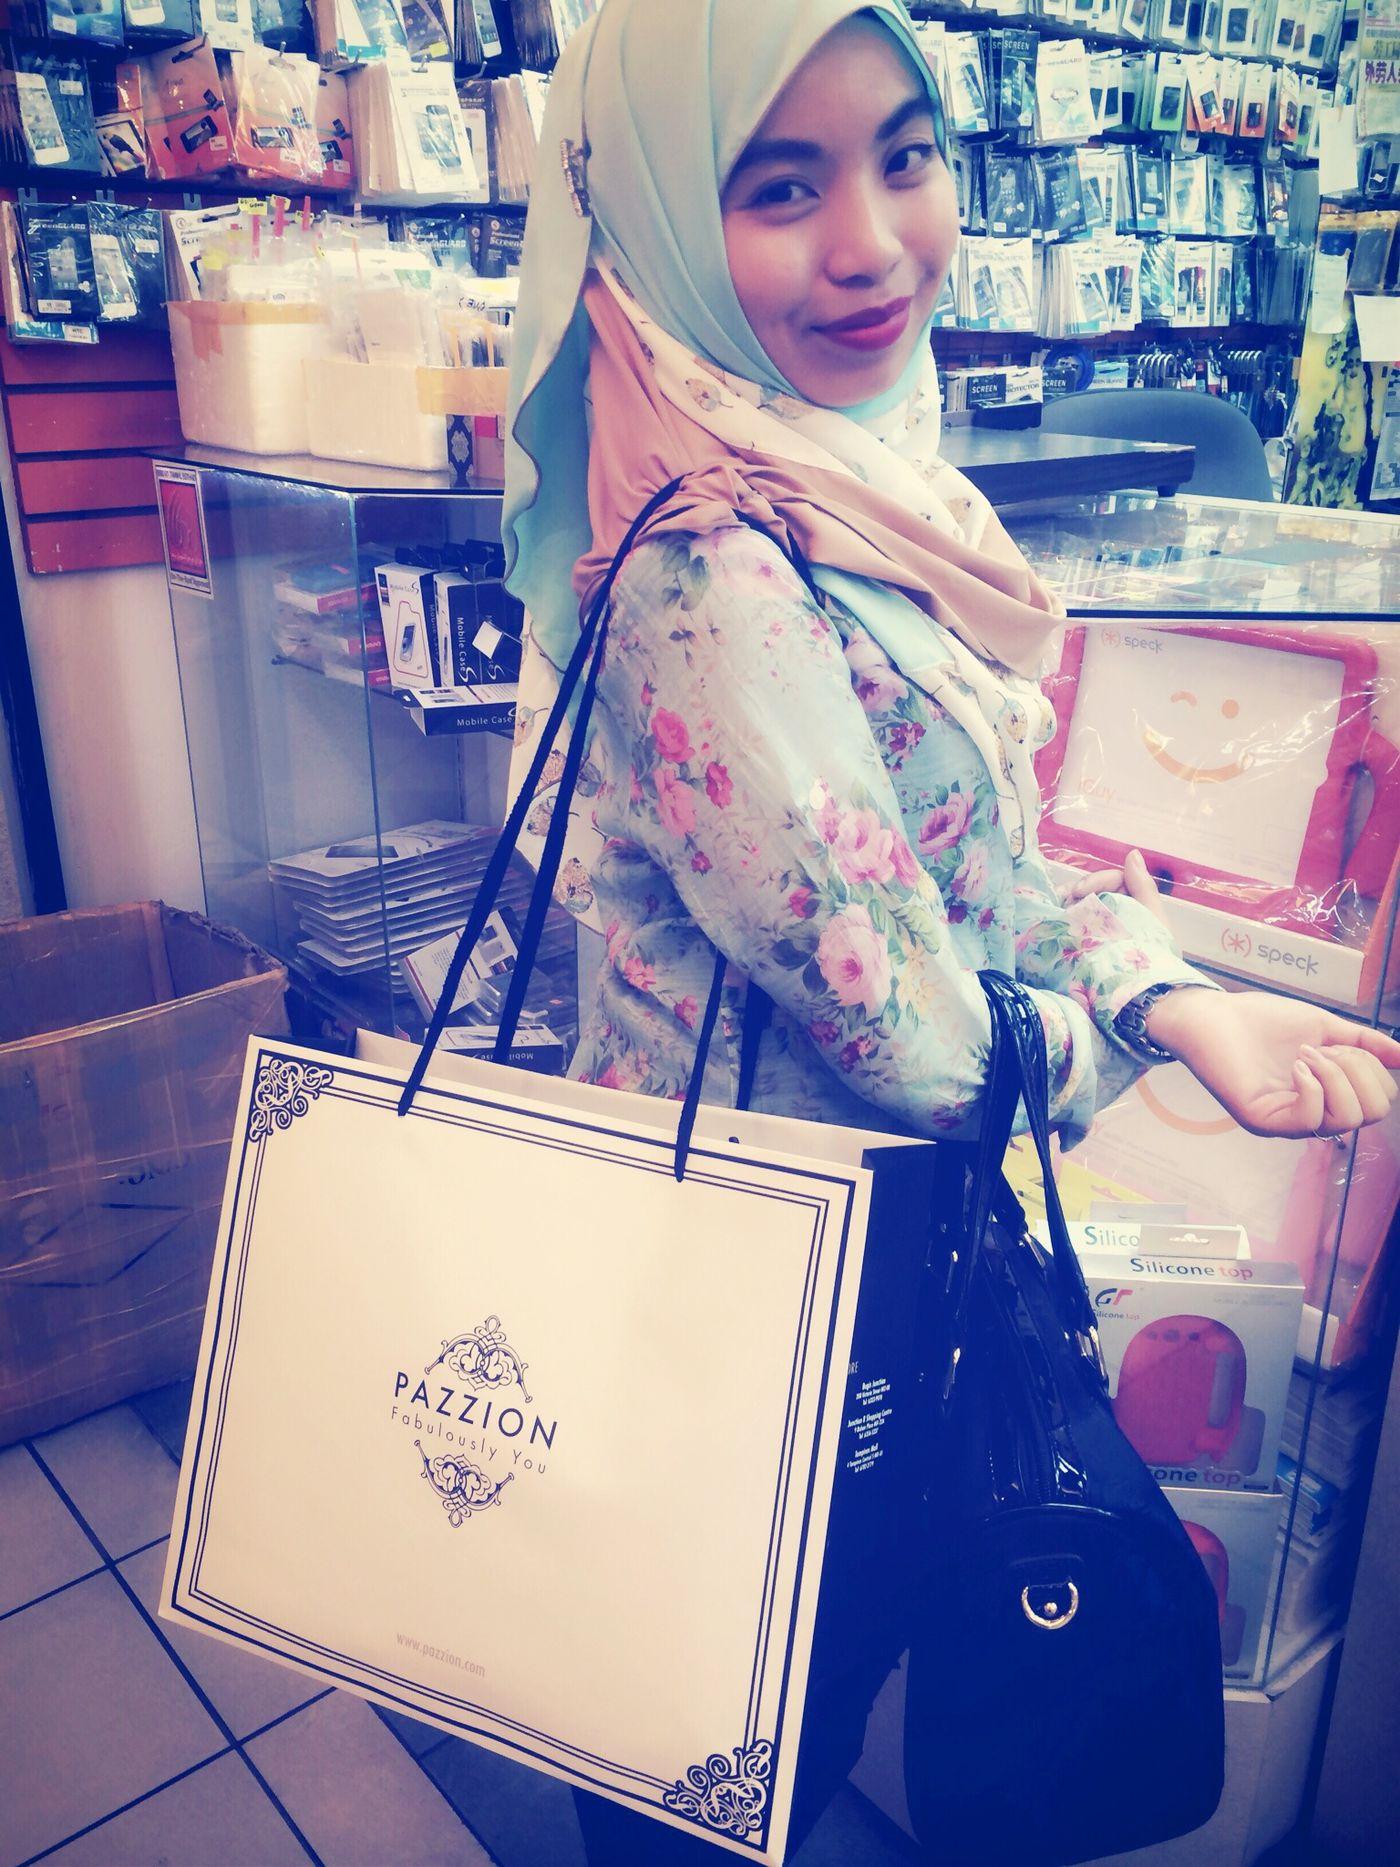 Girls just loved to shop! Shopping ♡ Pazzionlovers Brunei Darussalam New Heels